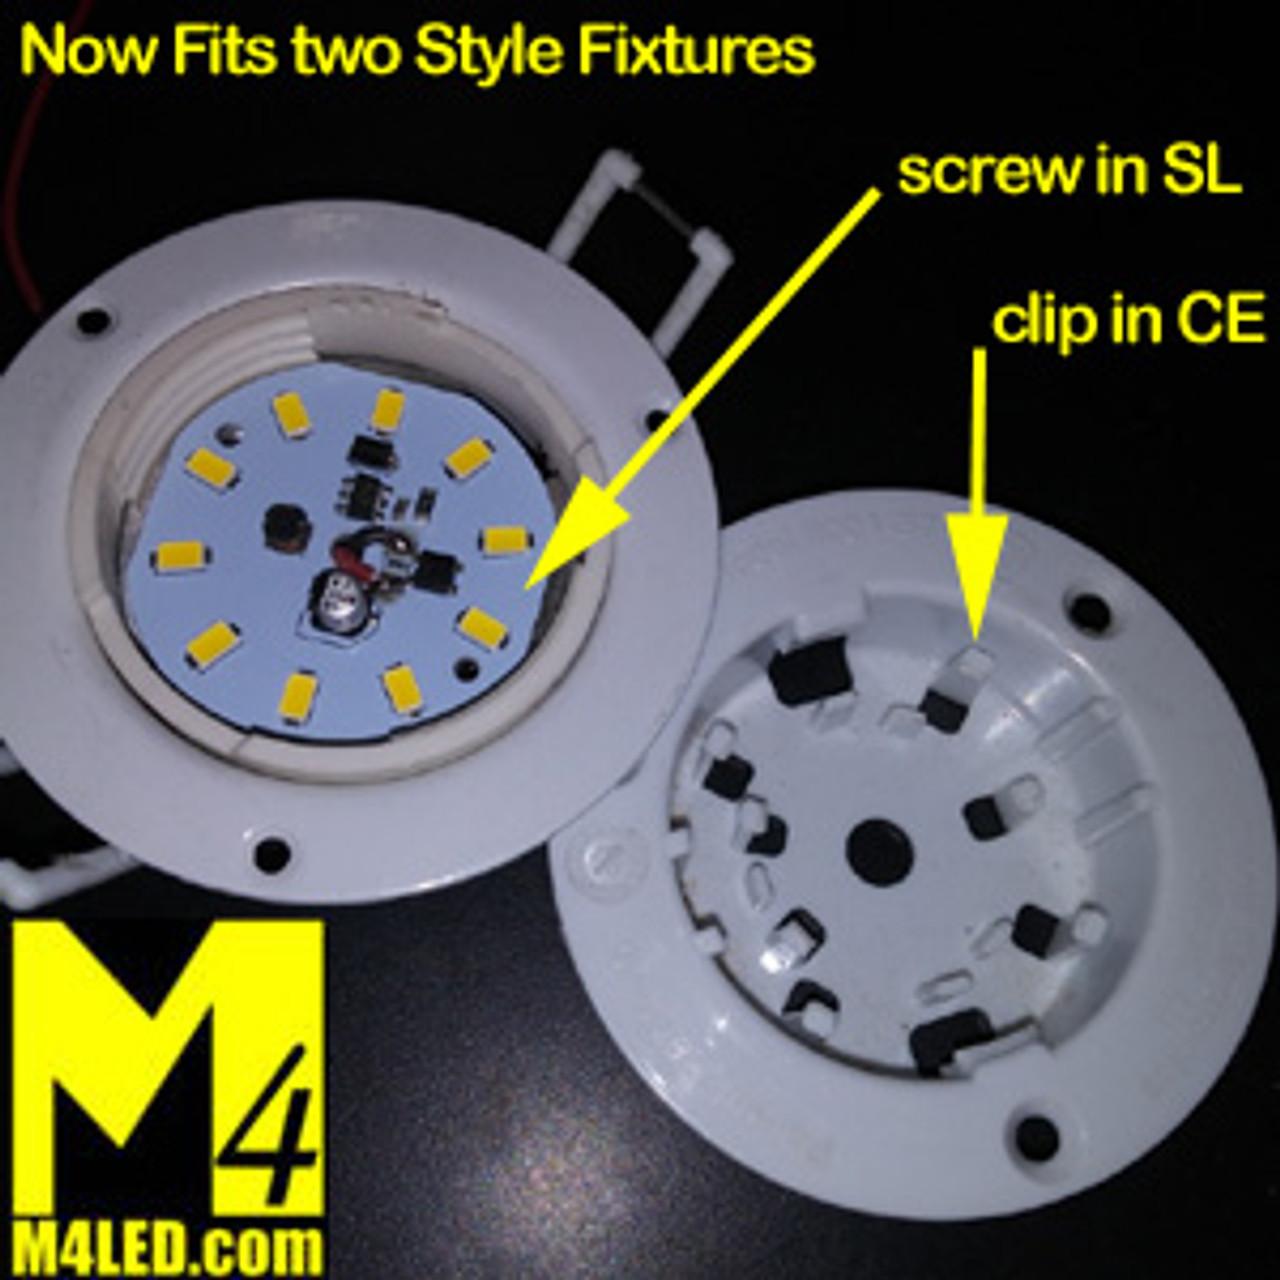 RETROFIT-10-5630-WIRE-WW Replacement for C.E. 58 LED Fixture Warm White